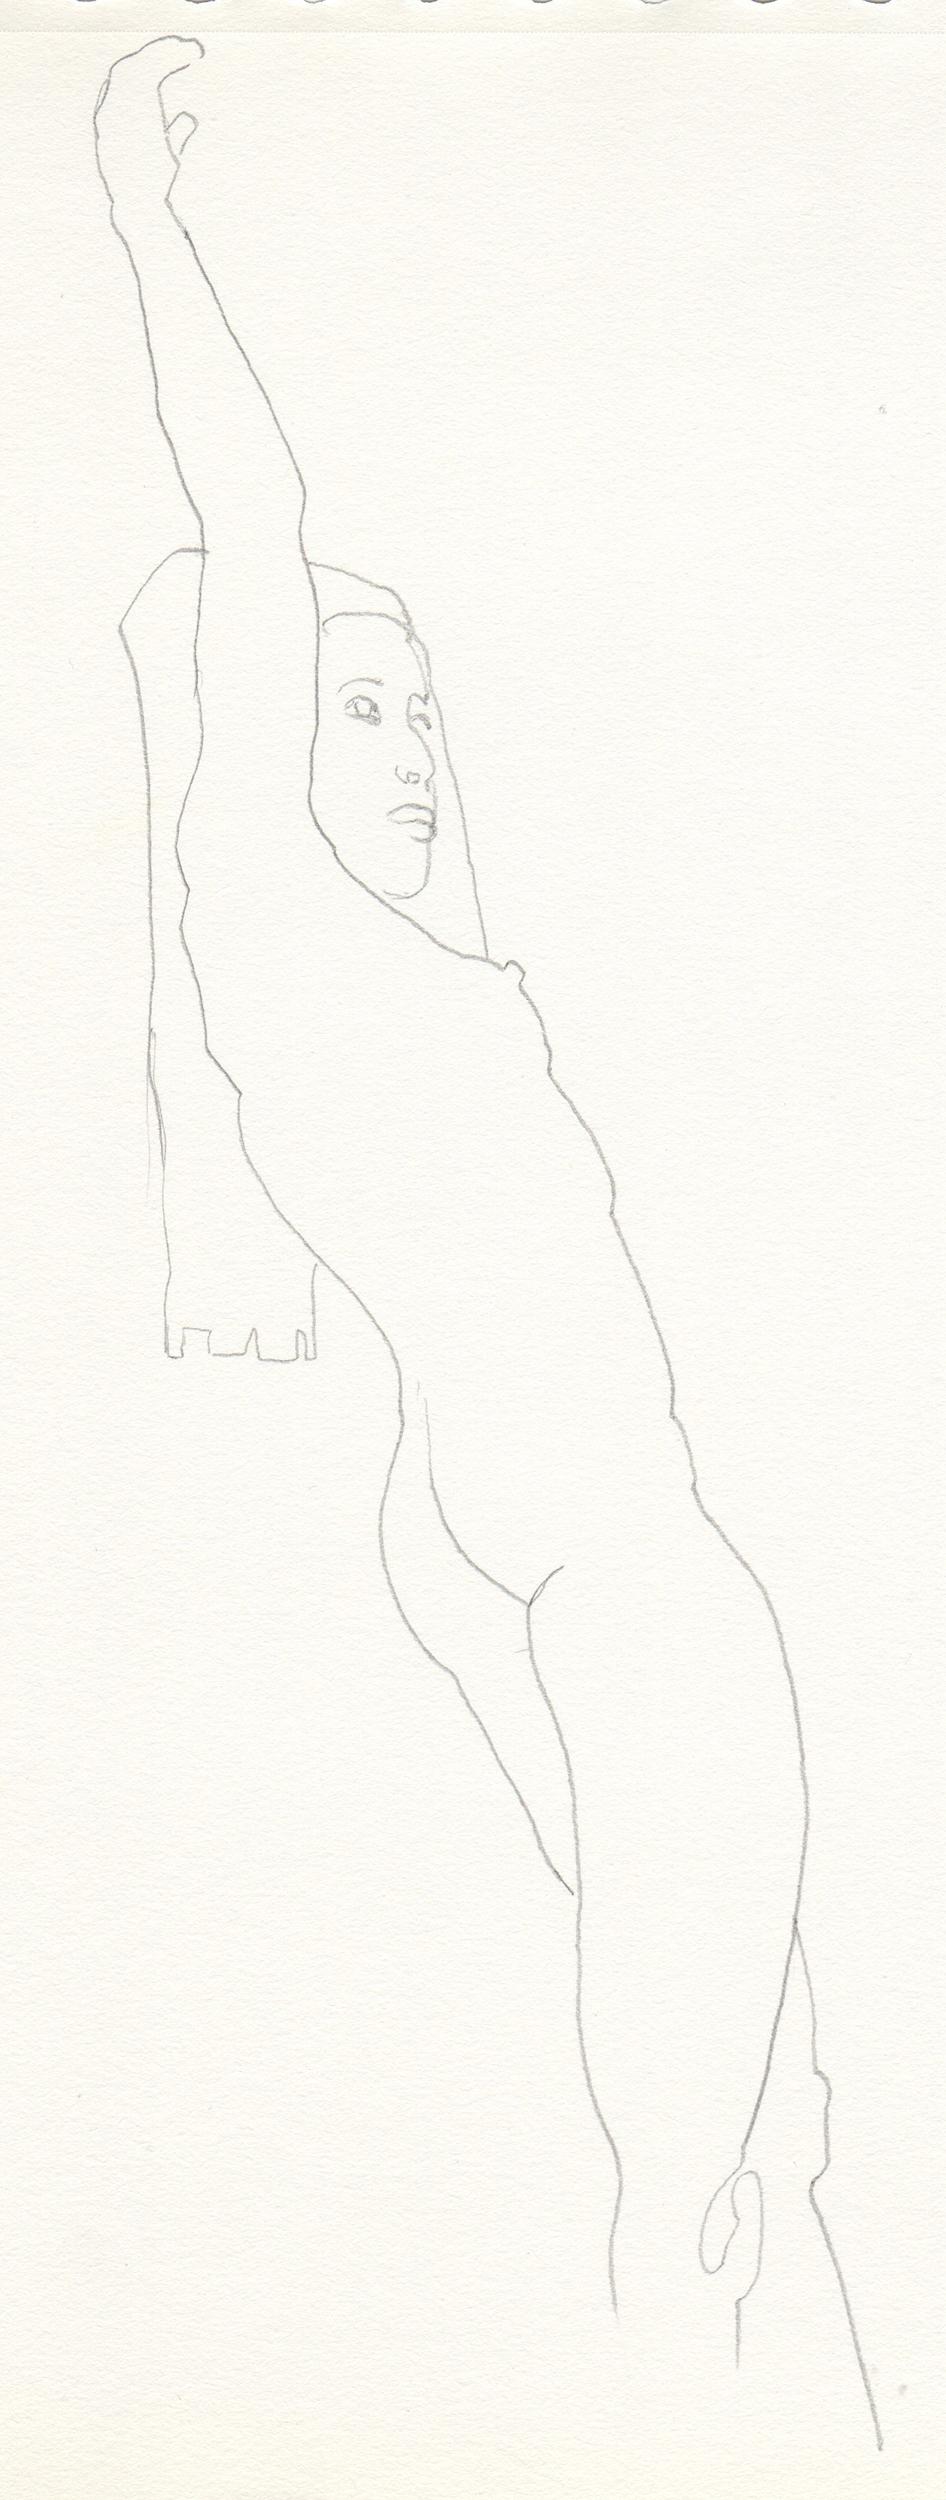 2012_Sketch_F-Beudin_019